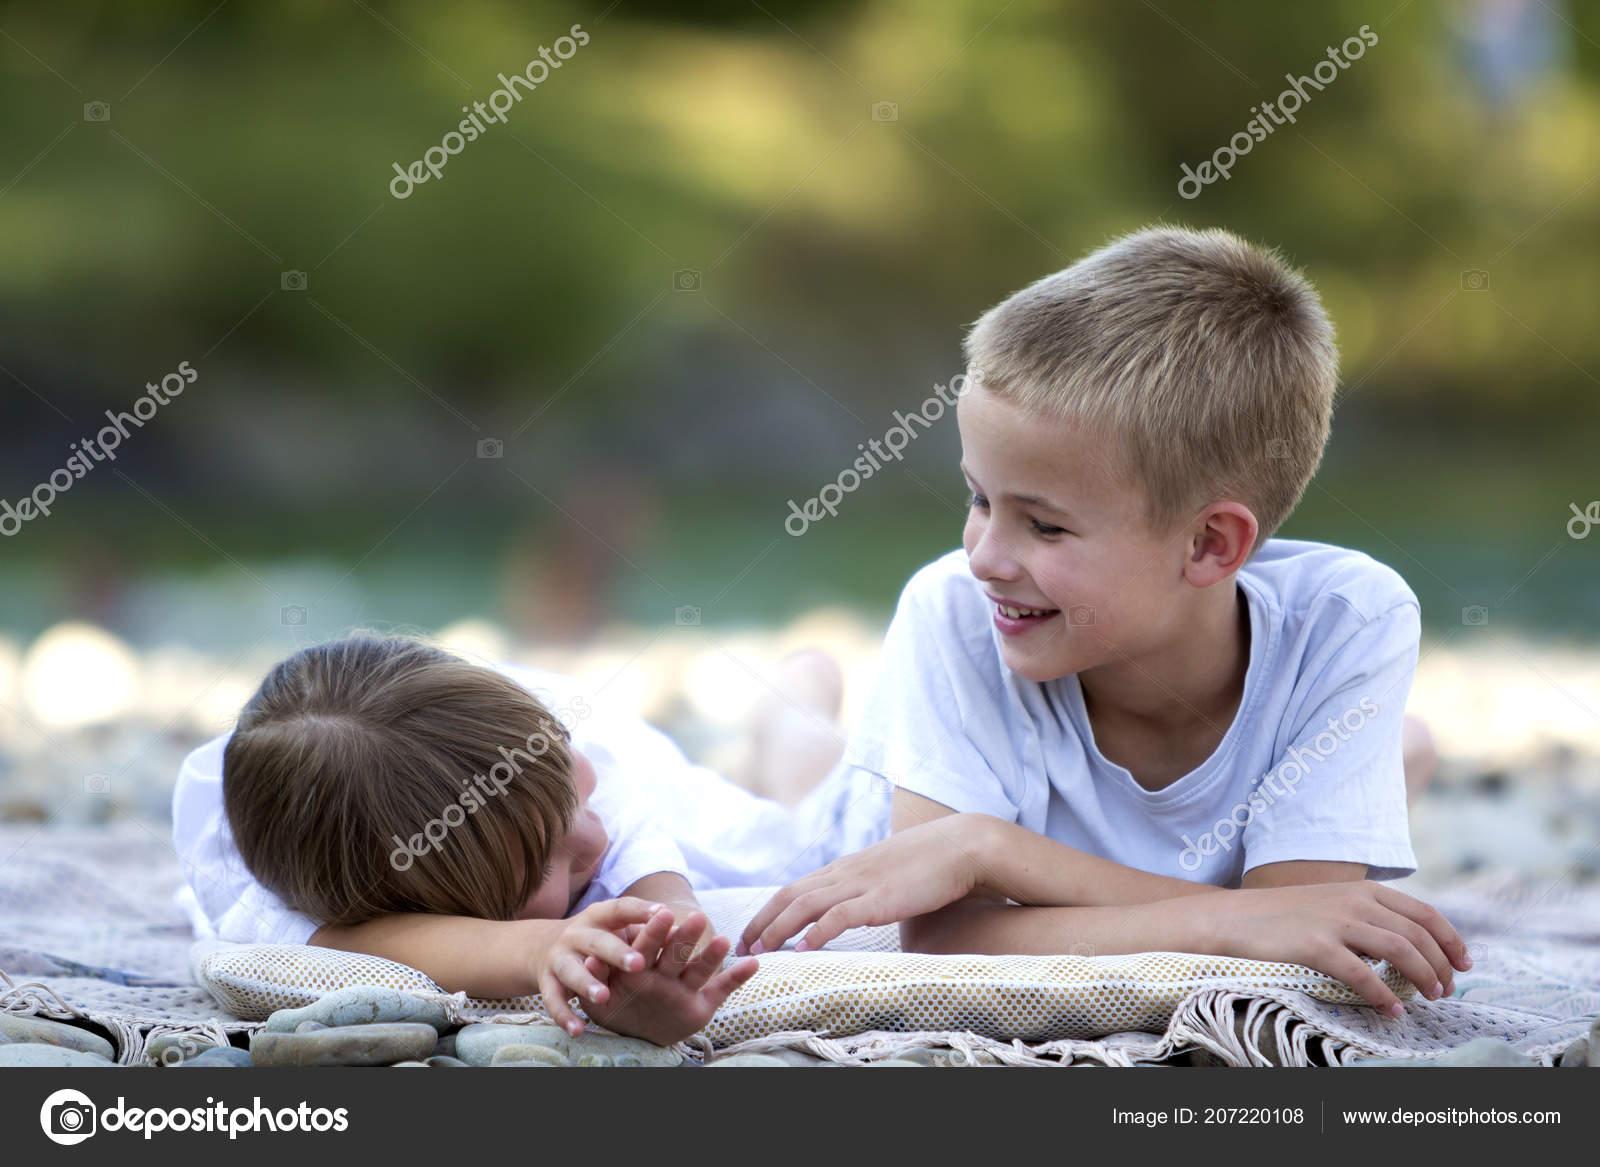 b24d048baa8 Δύο Νέοι Ευτυχισμένη Χαριτωμένο Ξανθιά Γέλιο Παιδιά Αγόρι Και ...